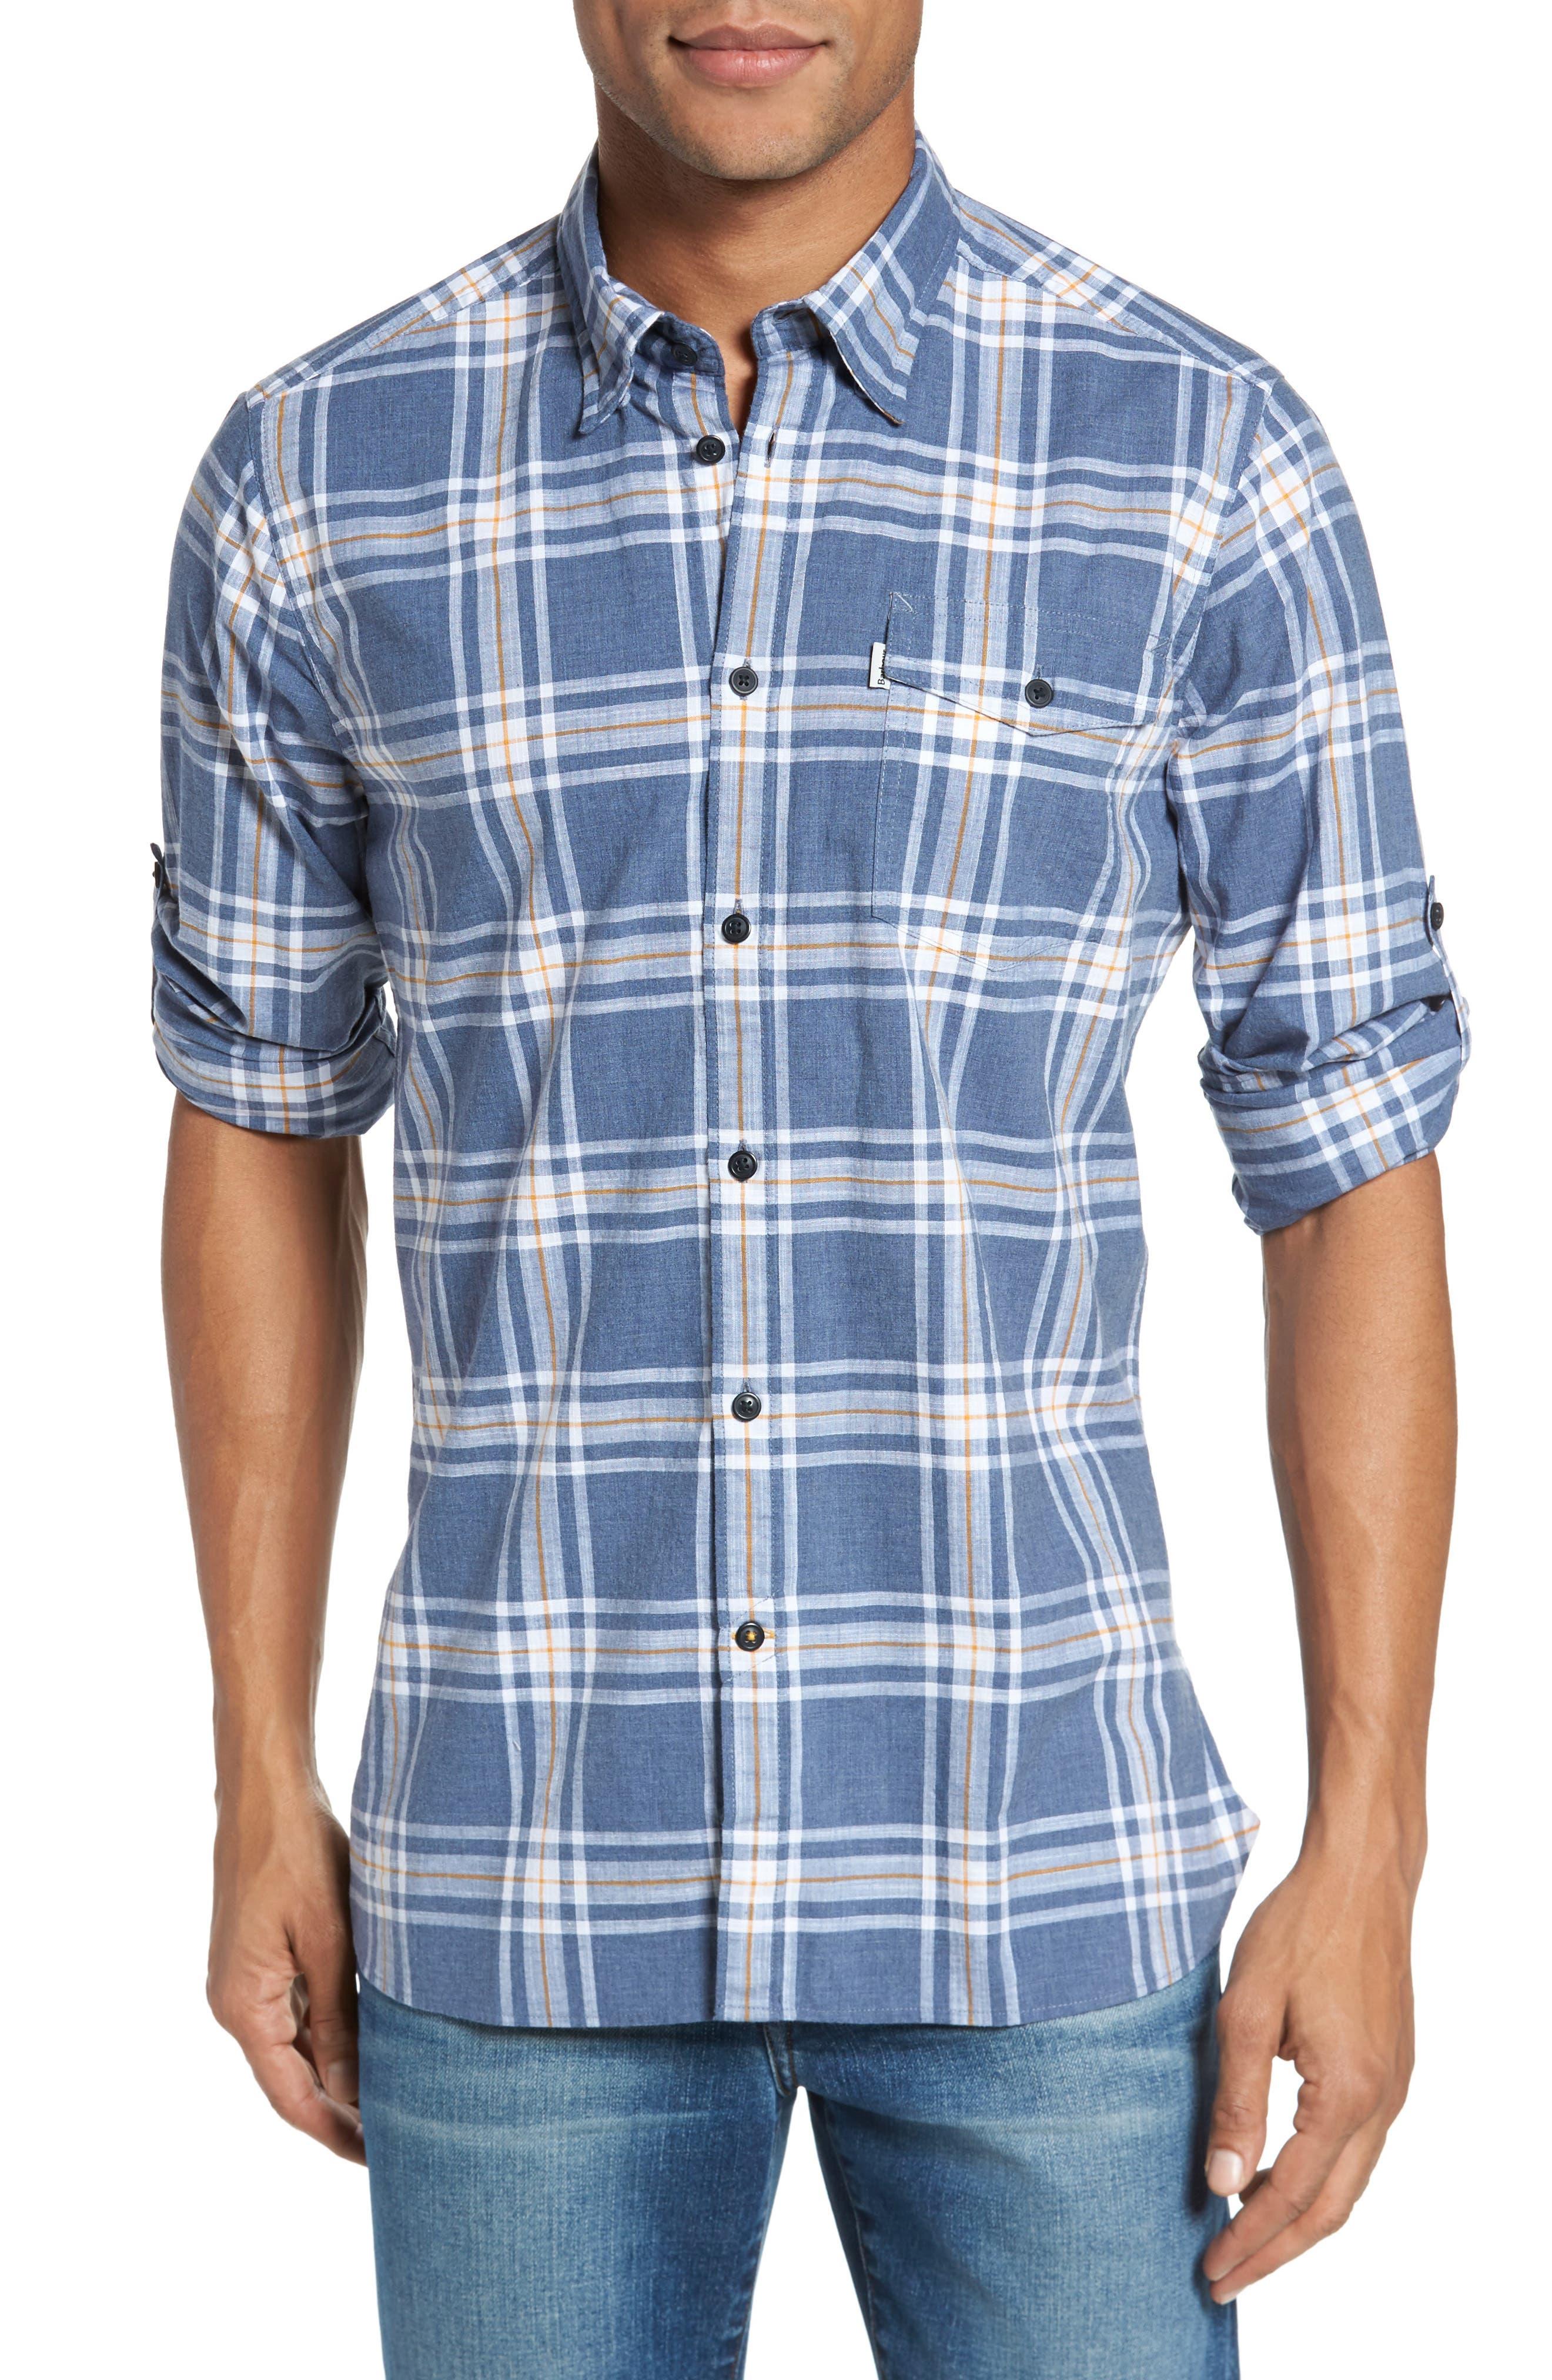 Elver Tailored Fit Plaid Sport Shirt,                             Main thumbnail 1, color,                             Navy